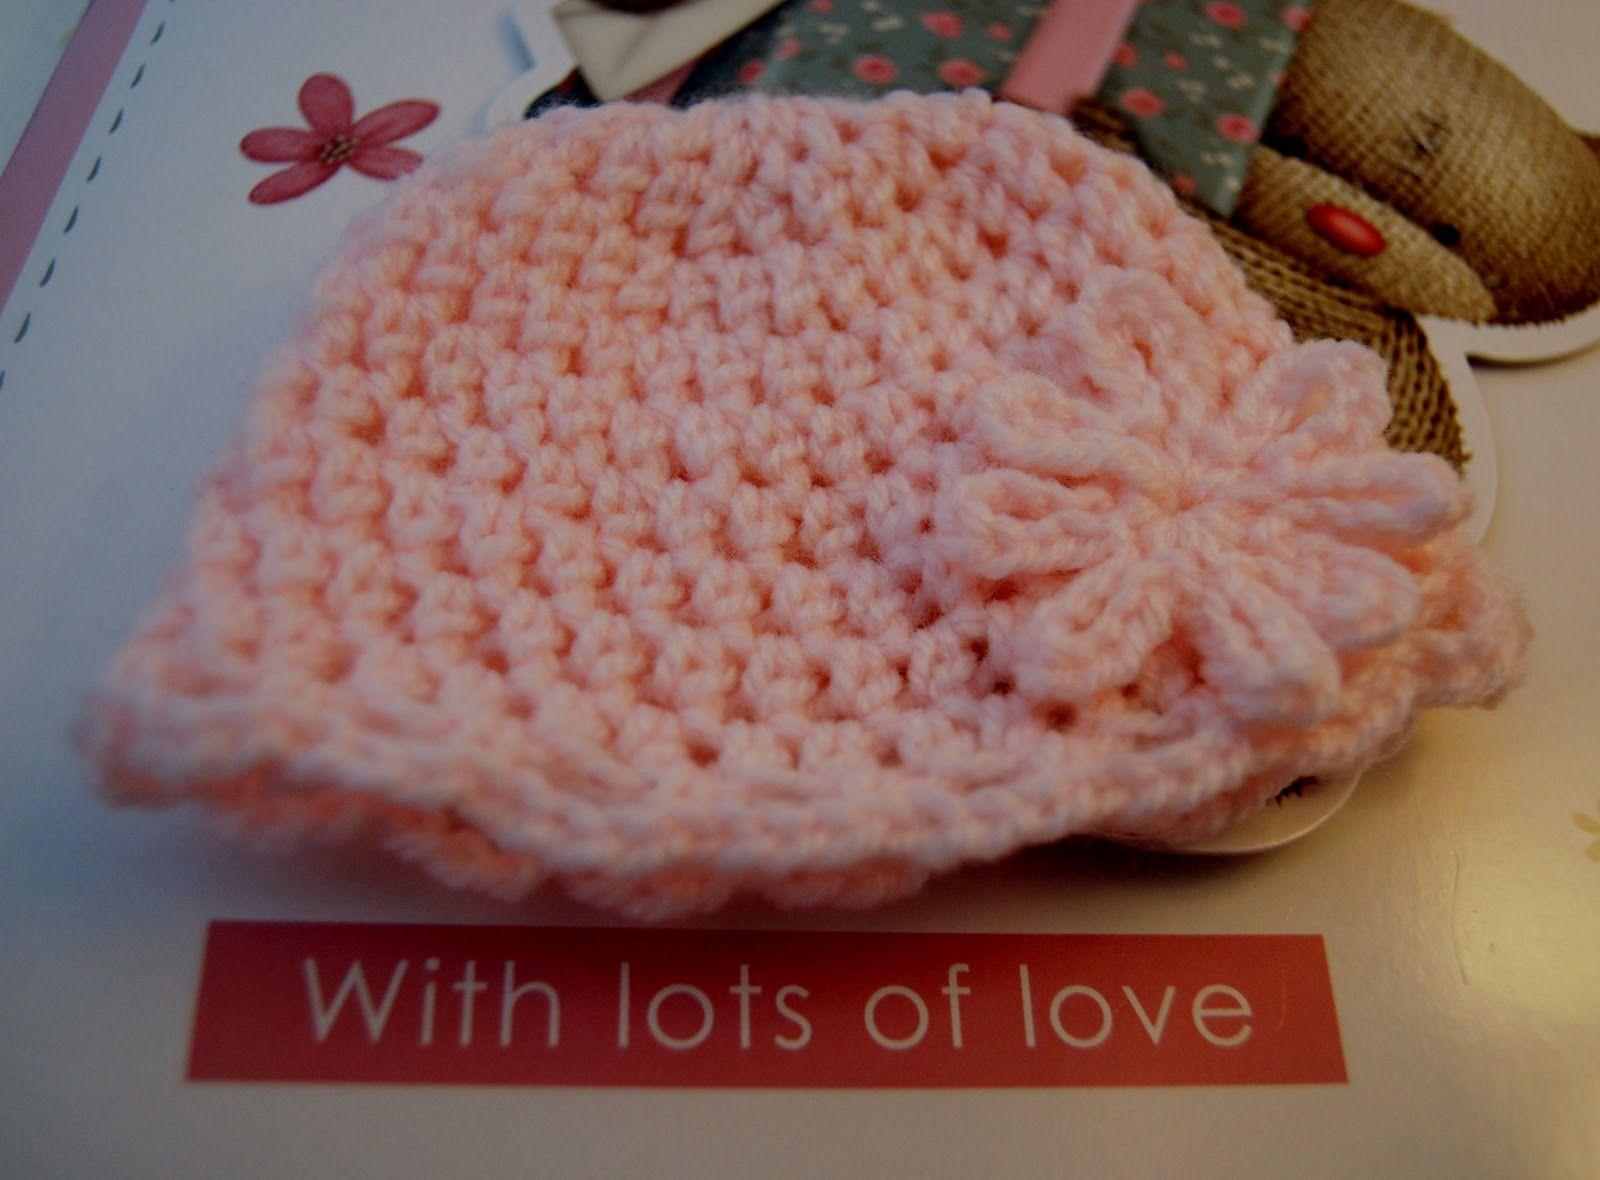 Free crochet pattern for newborn baby beanie hat crochet free crochet pattern for newborn baby beanie hat bankloansurffo Choice Image